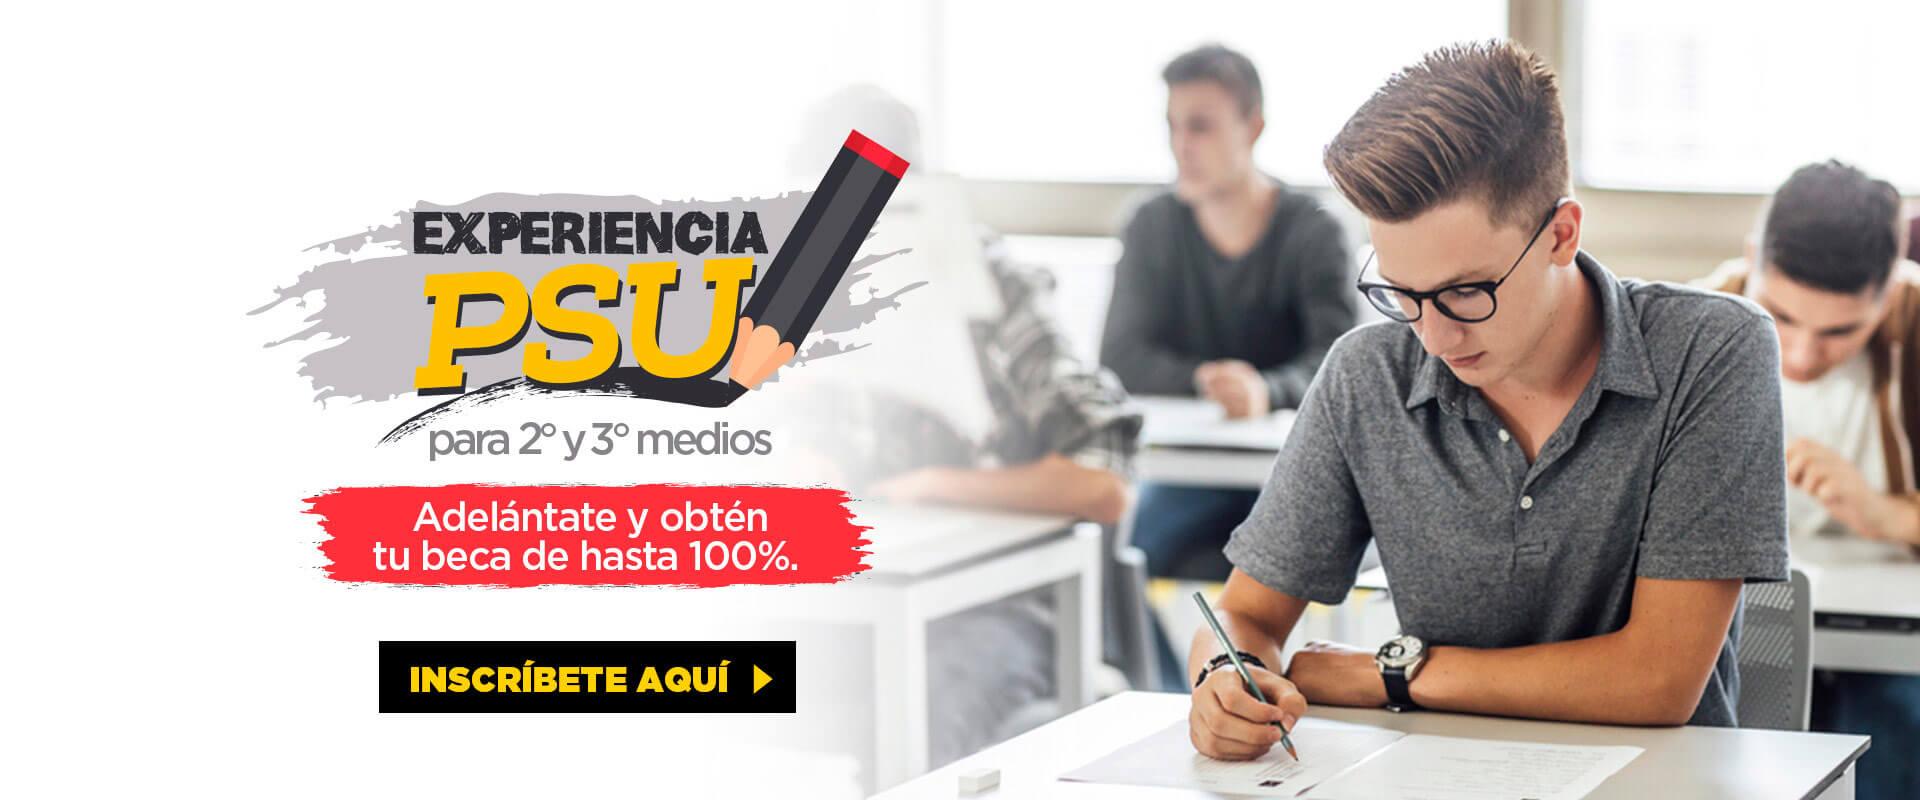 Exoeriencia PSU